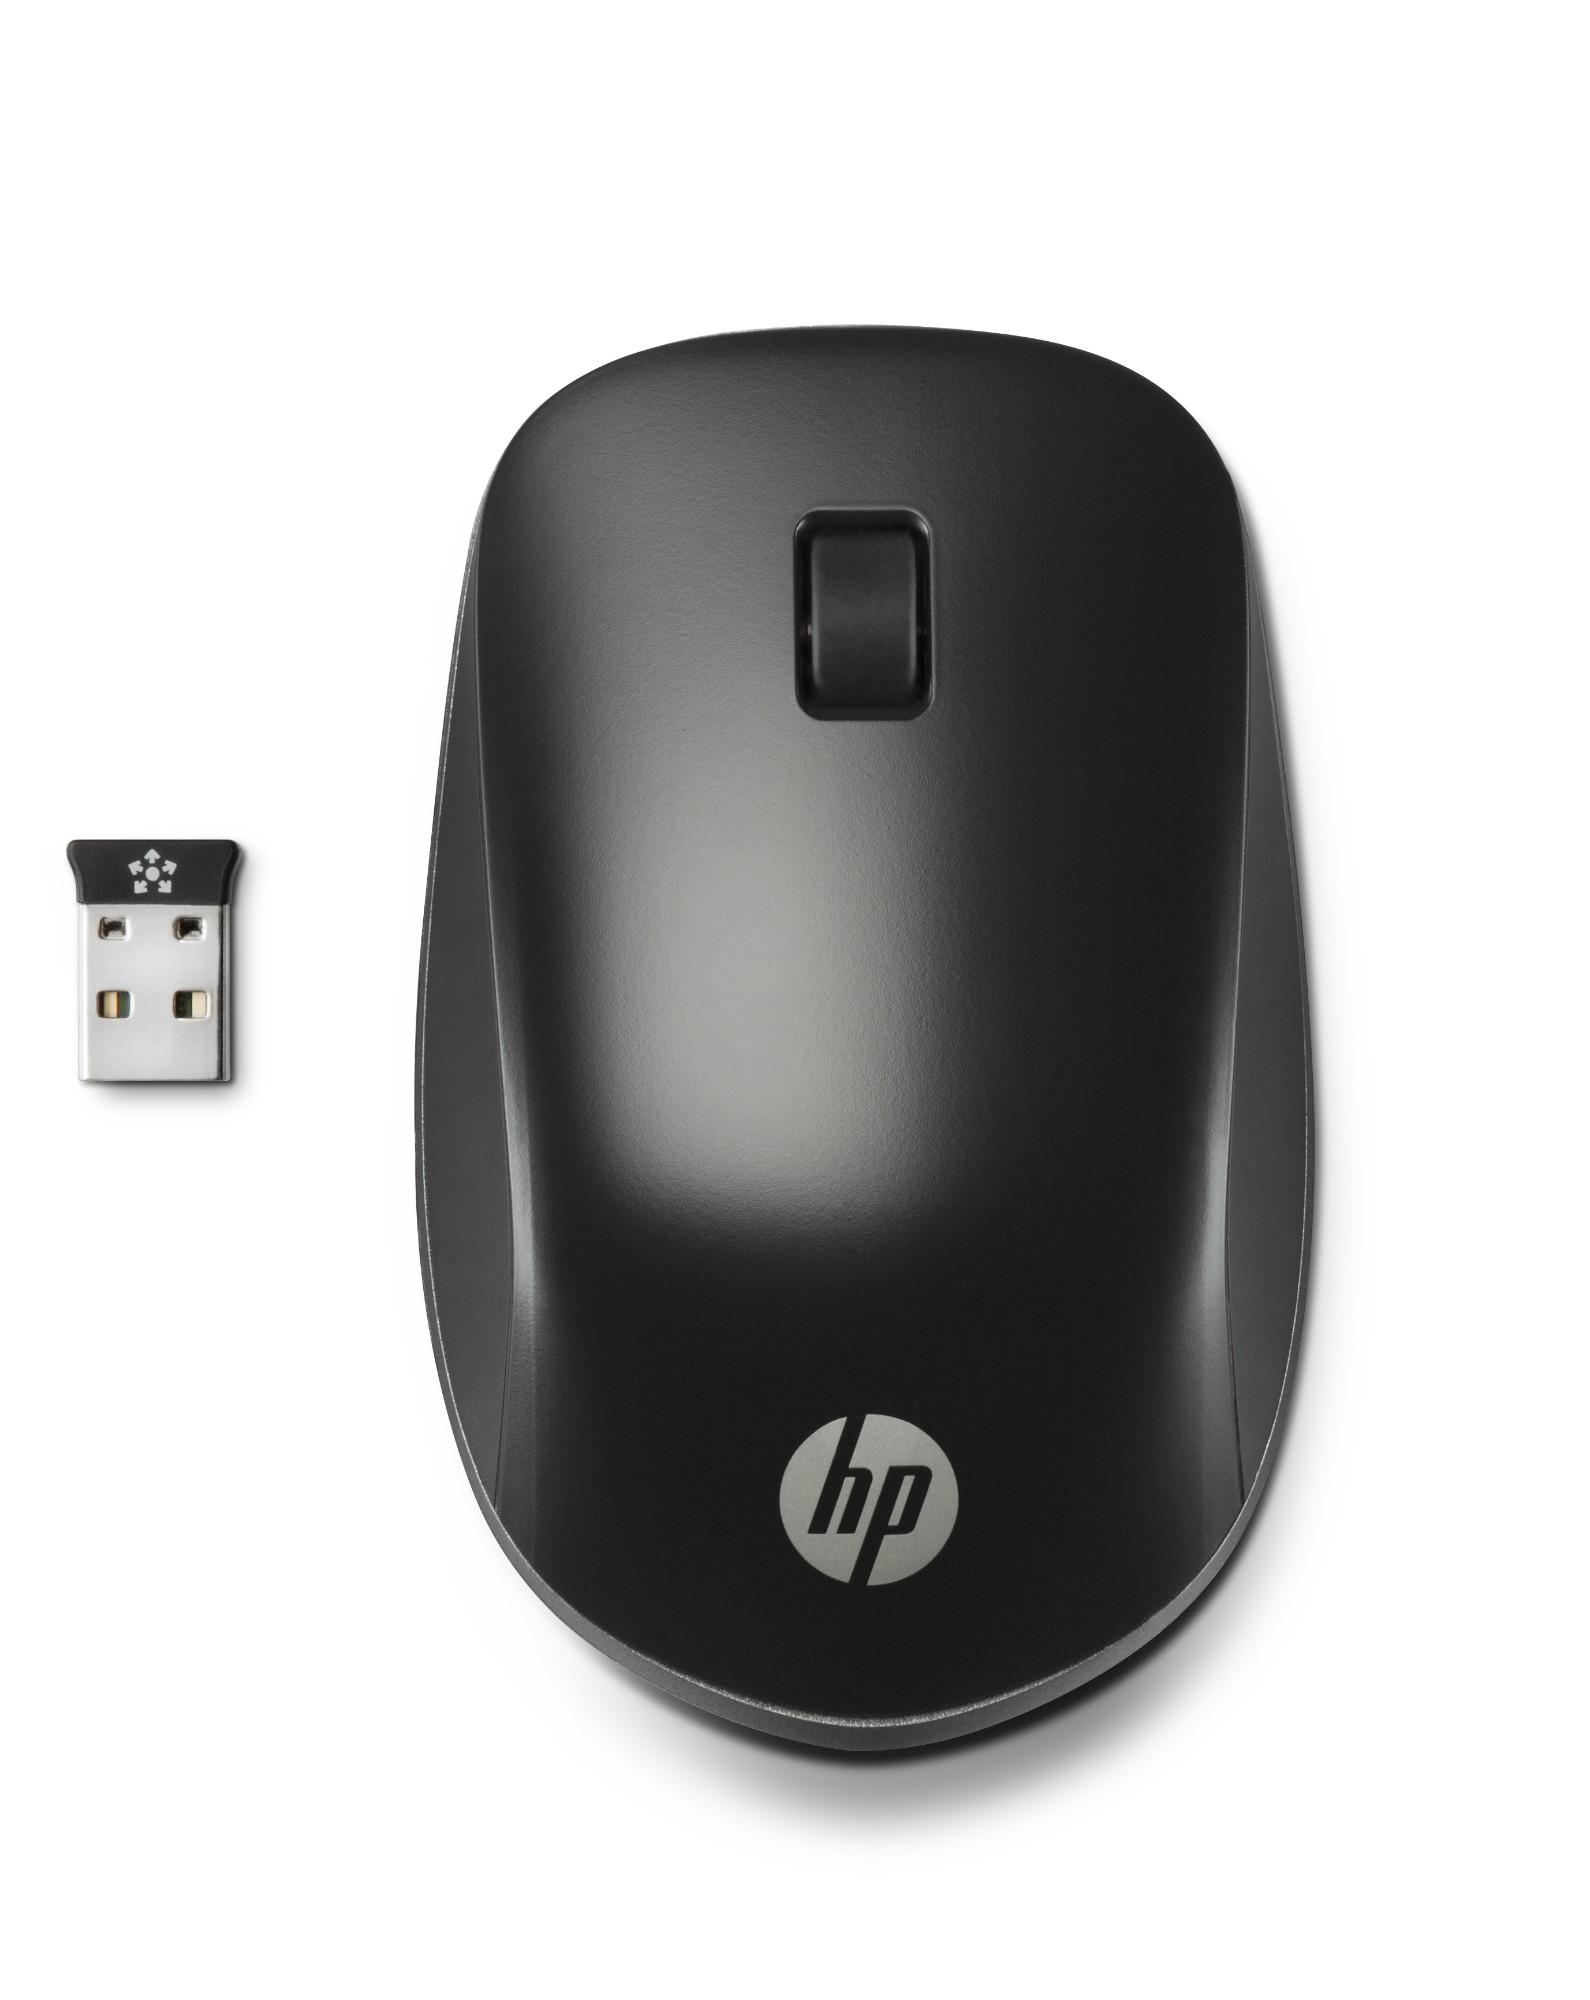 HP Ultra Mobile Wireless mouse Ambidextrous RF Wireless Optical 1200 DPI